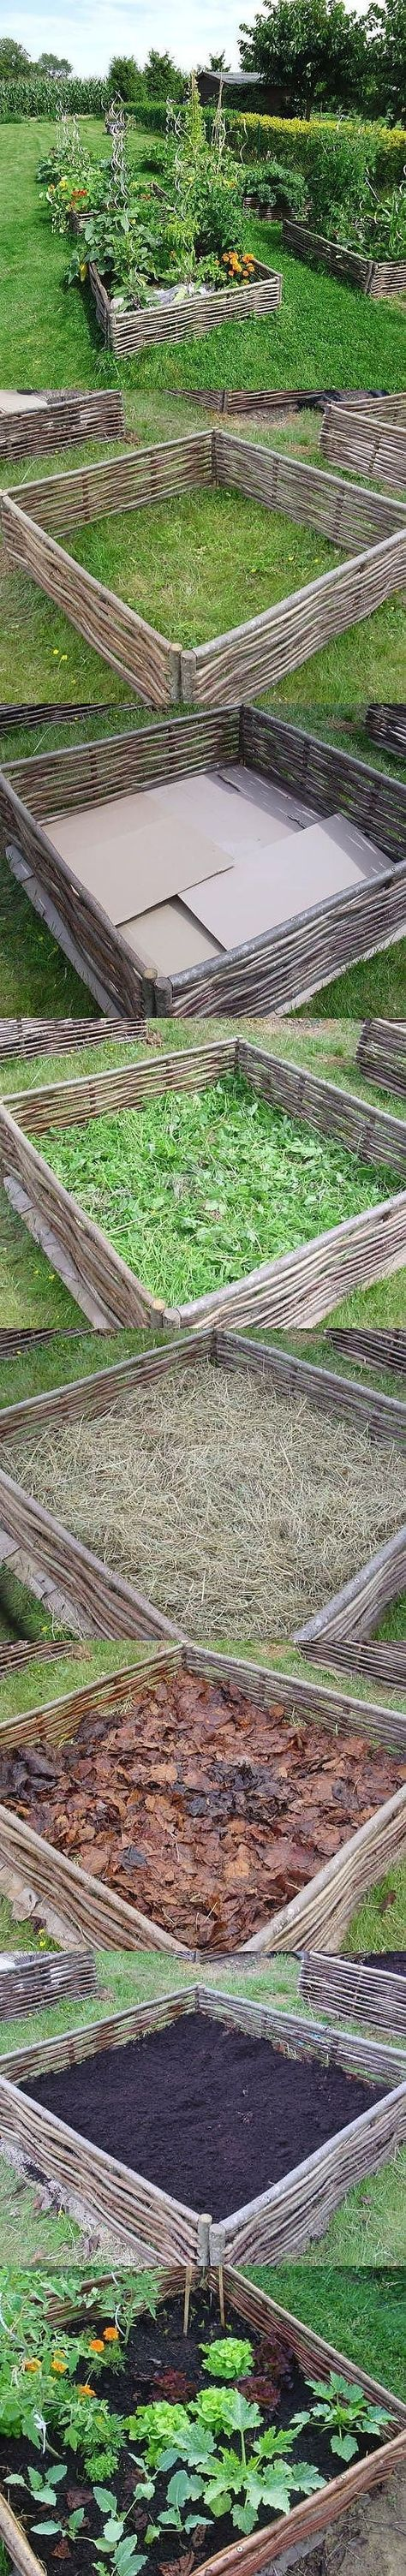 Building a lasagna raised bed garden   Garden and Yard   Фазенда.   Постила